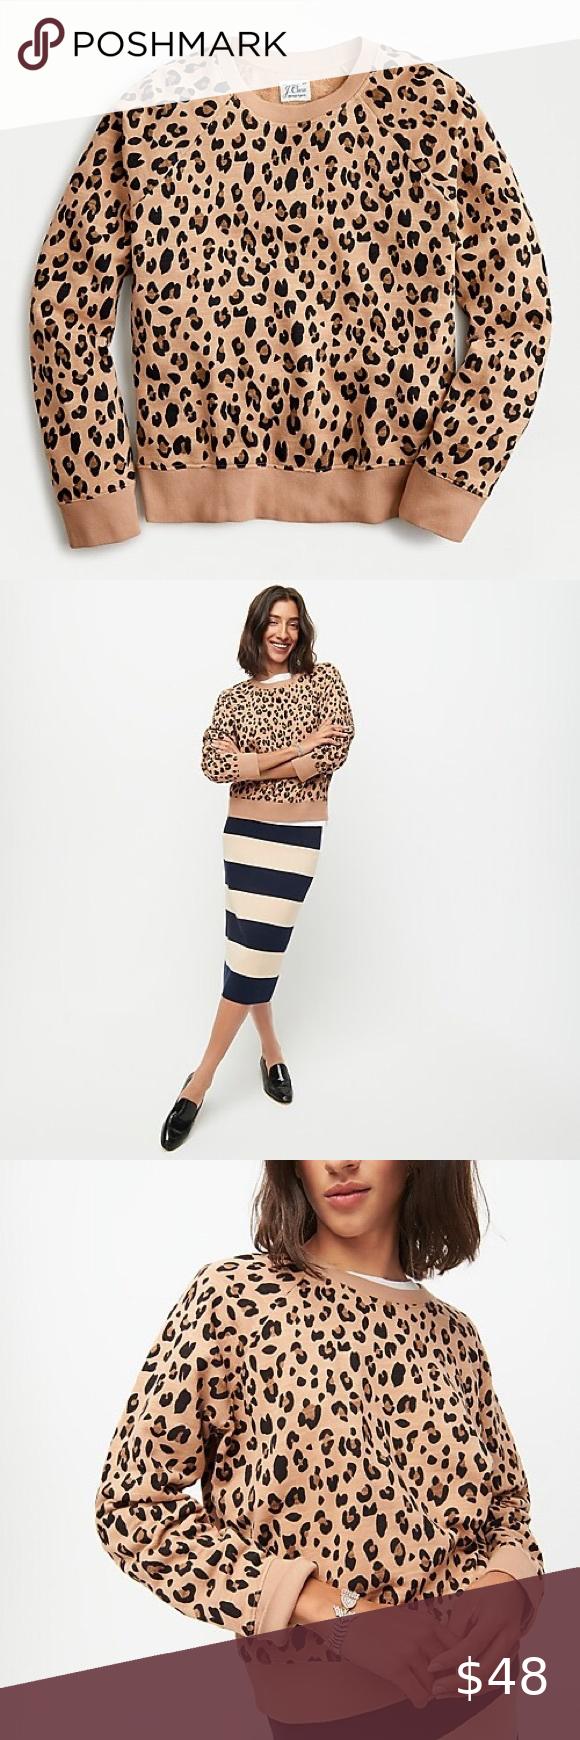 Nwt Jcrew Leopard Print Sweatshirt Best Seller Vintage Cotton Terry Crewneck Sweatshirt In Leopard P In 2020 Leopard Print Sweatshirt Printed Sweatshirts Leopard Print [ 1740 x 580 Pixel ]